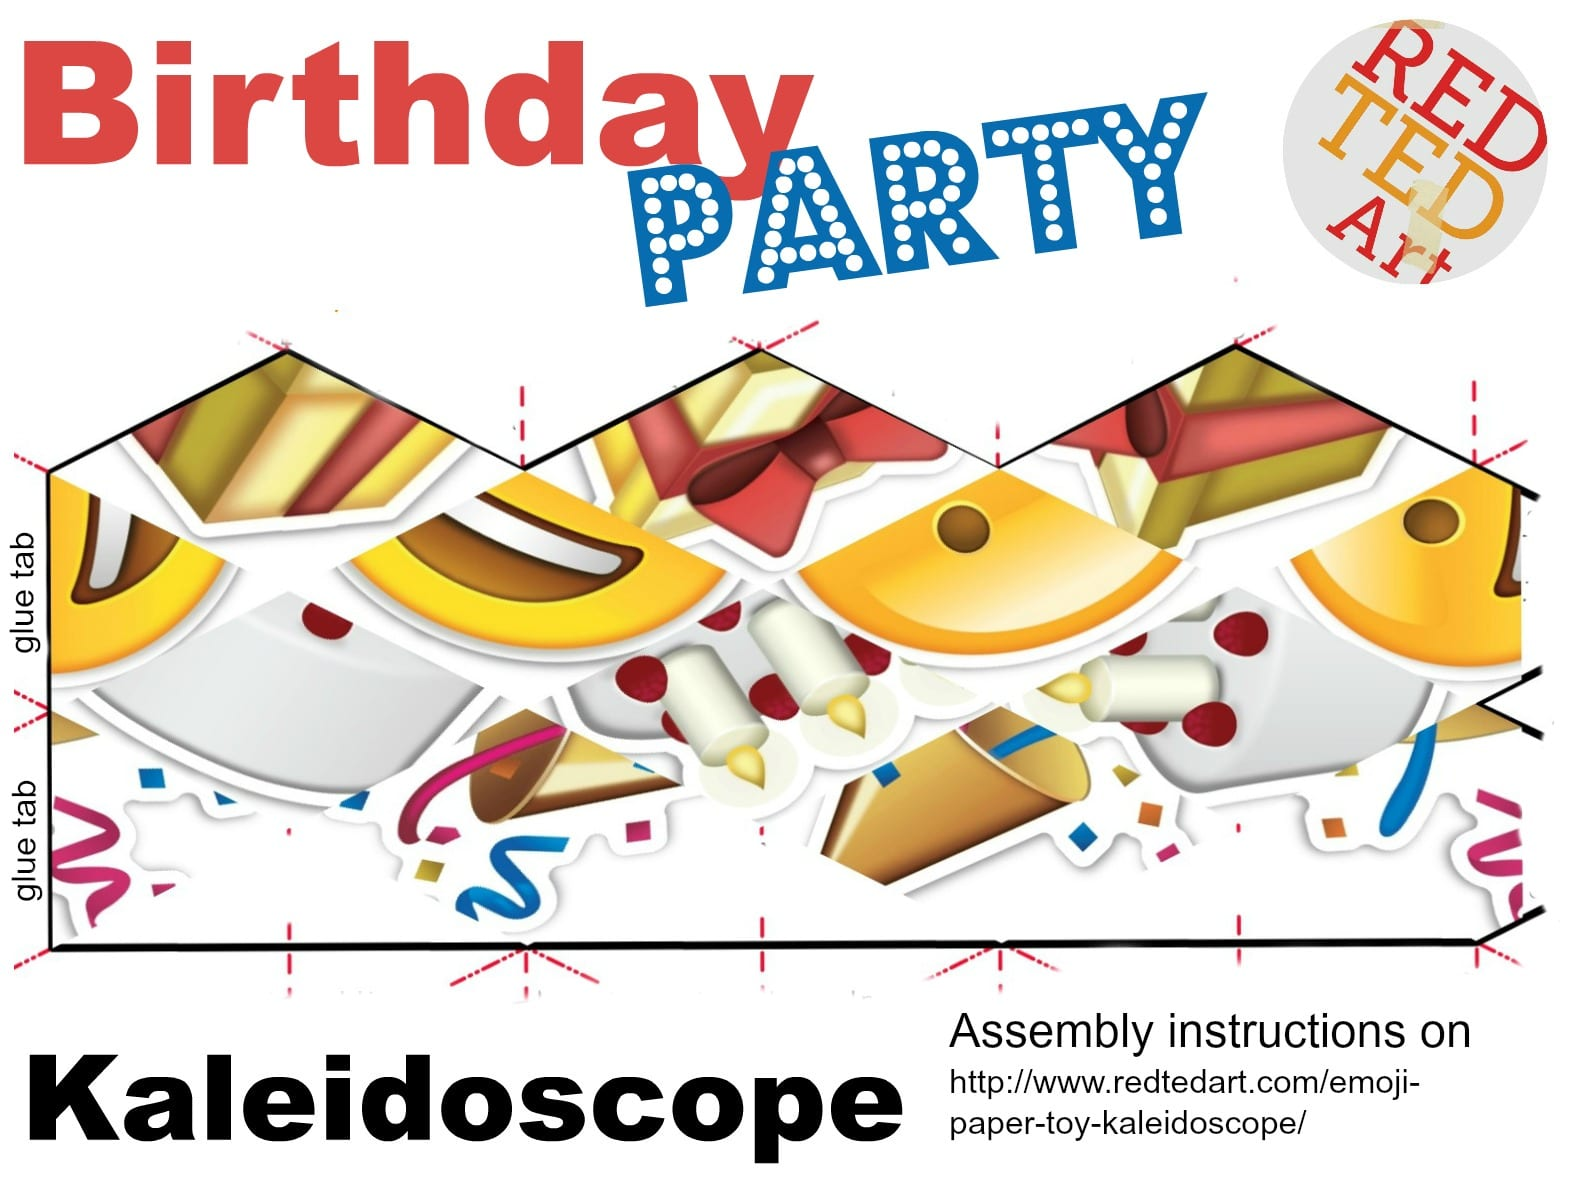 Emoji Paper Toy Kaleidoscope